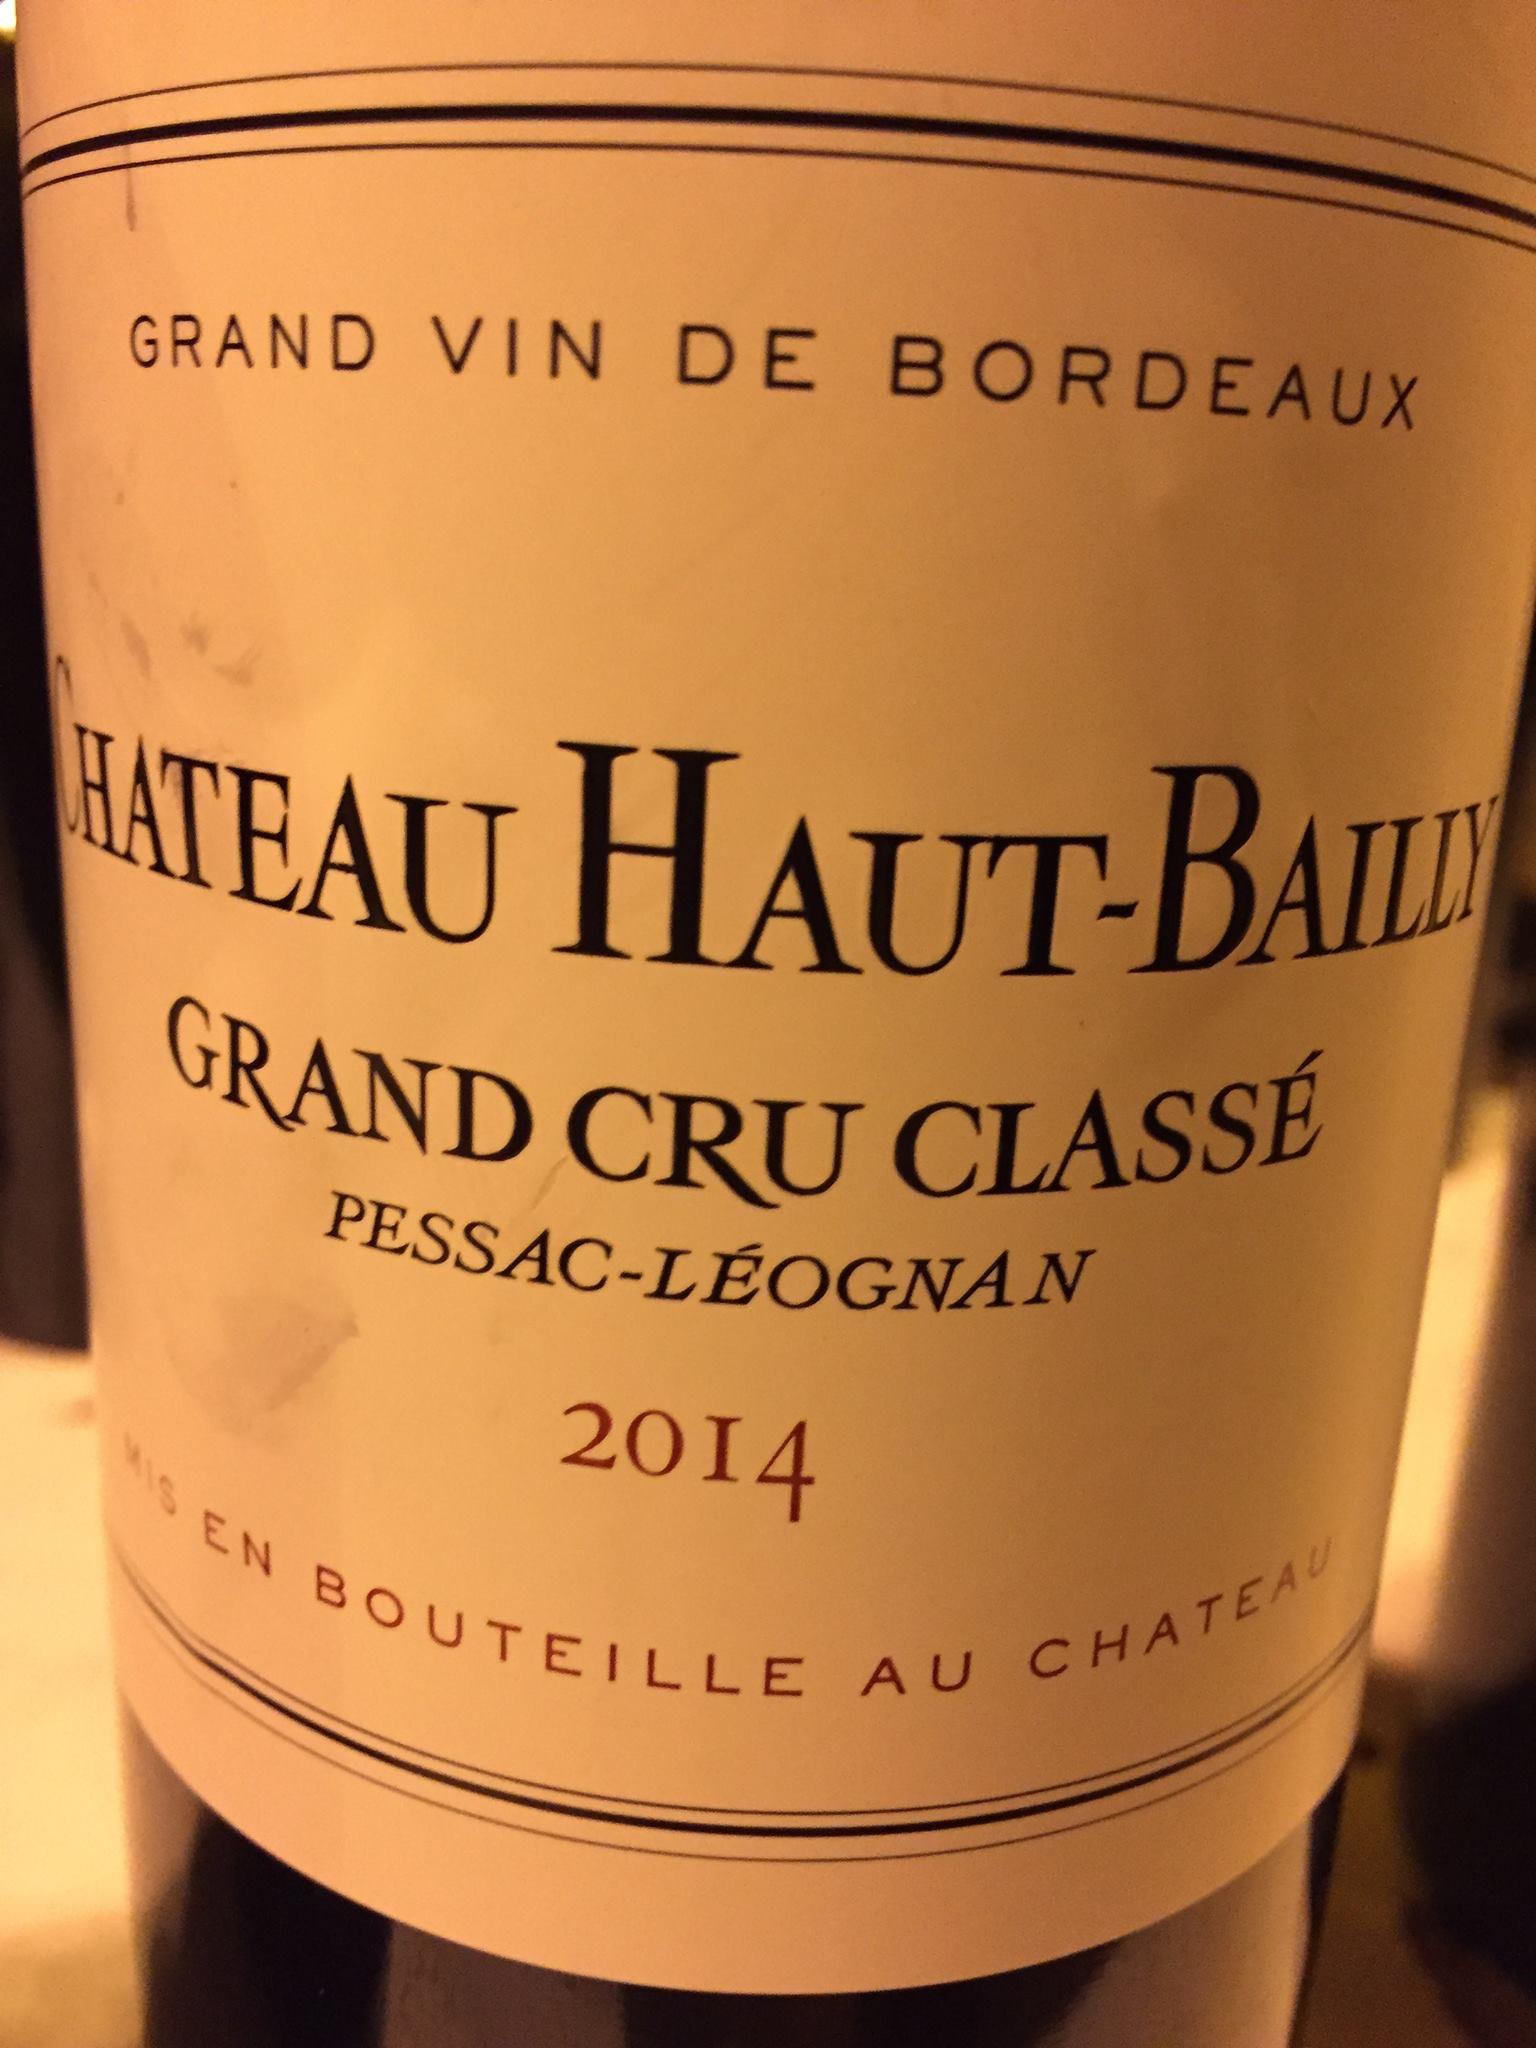 Château Haut-Bailly 2014 – Pessac-Léognan, Grand Cru Classé de Graves